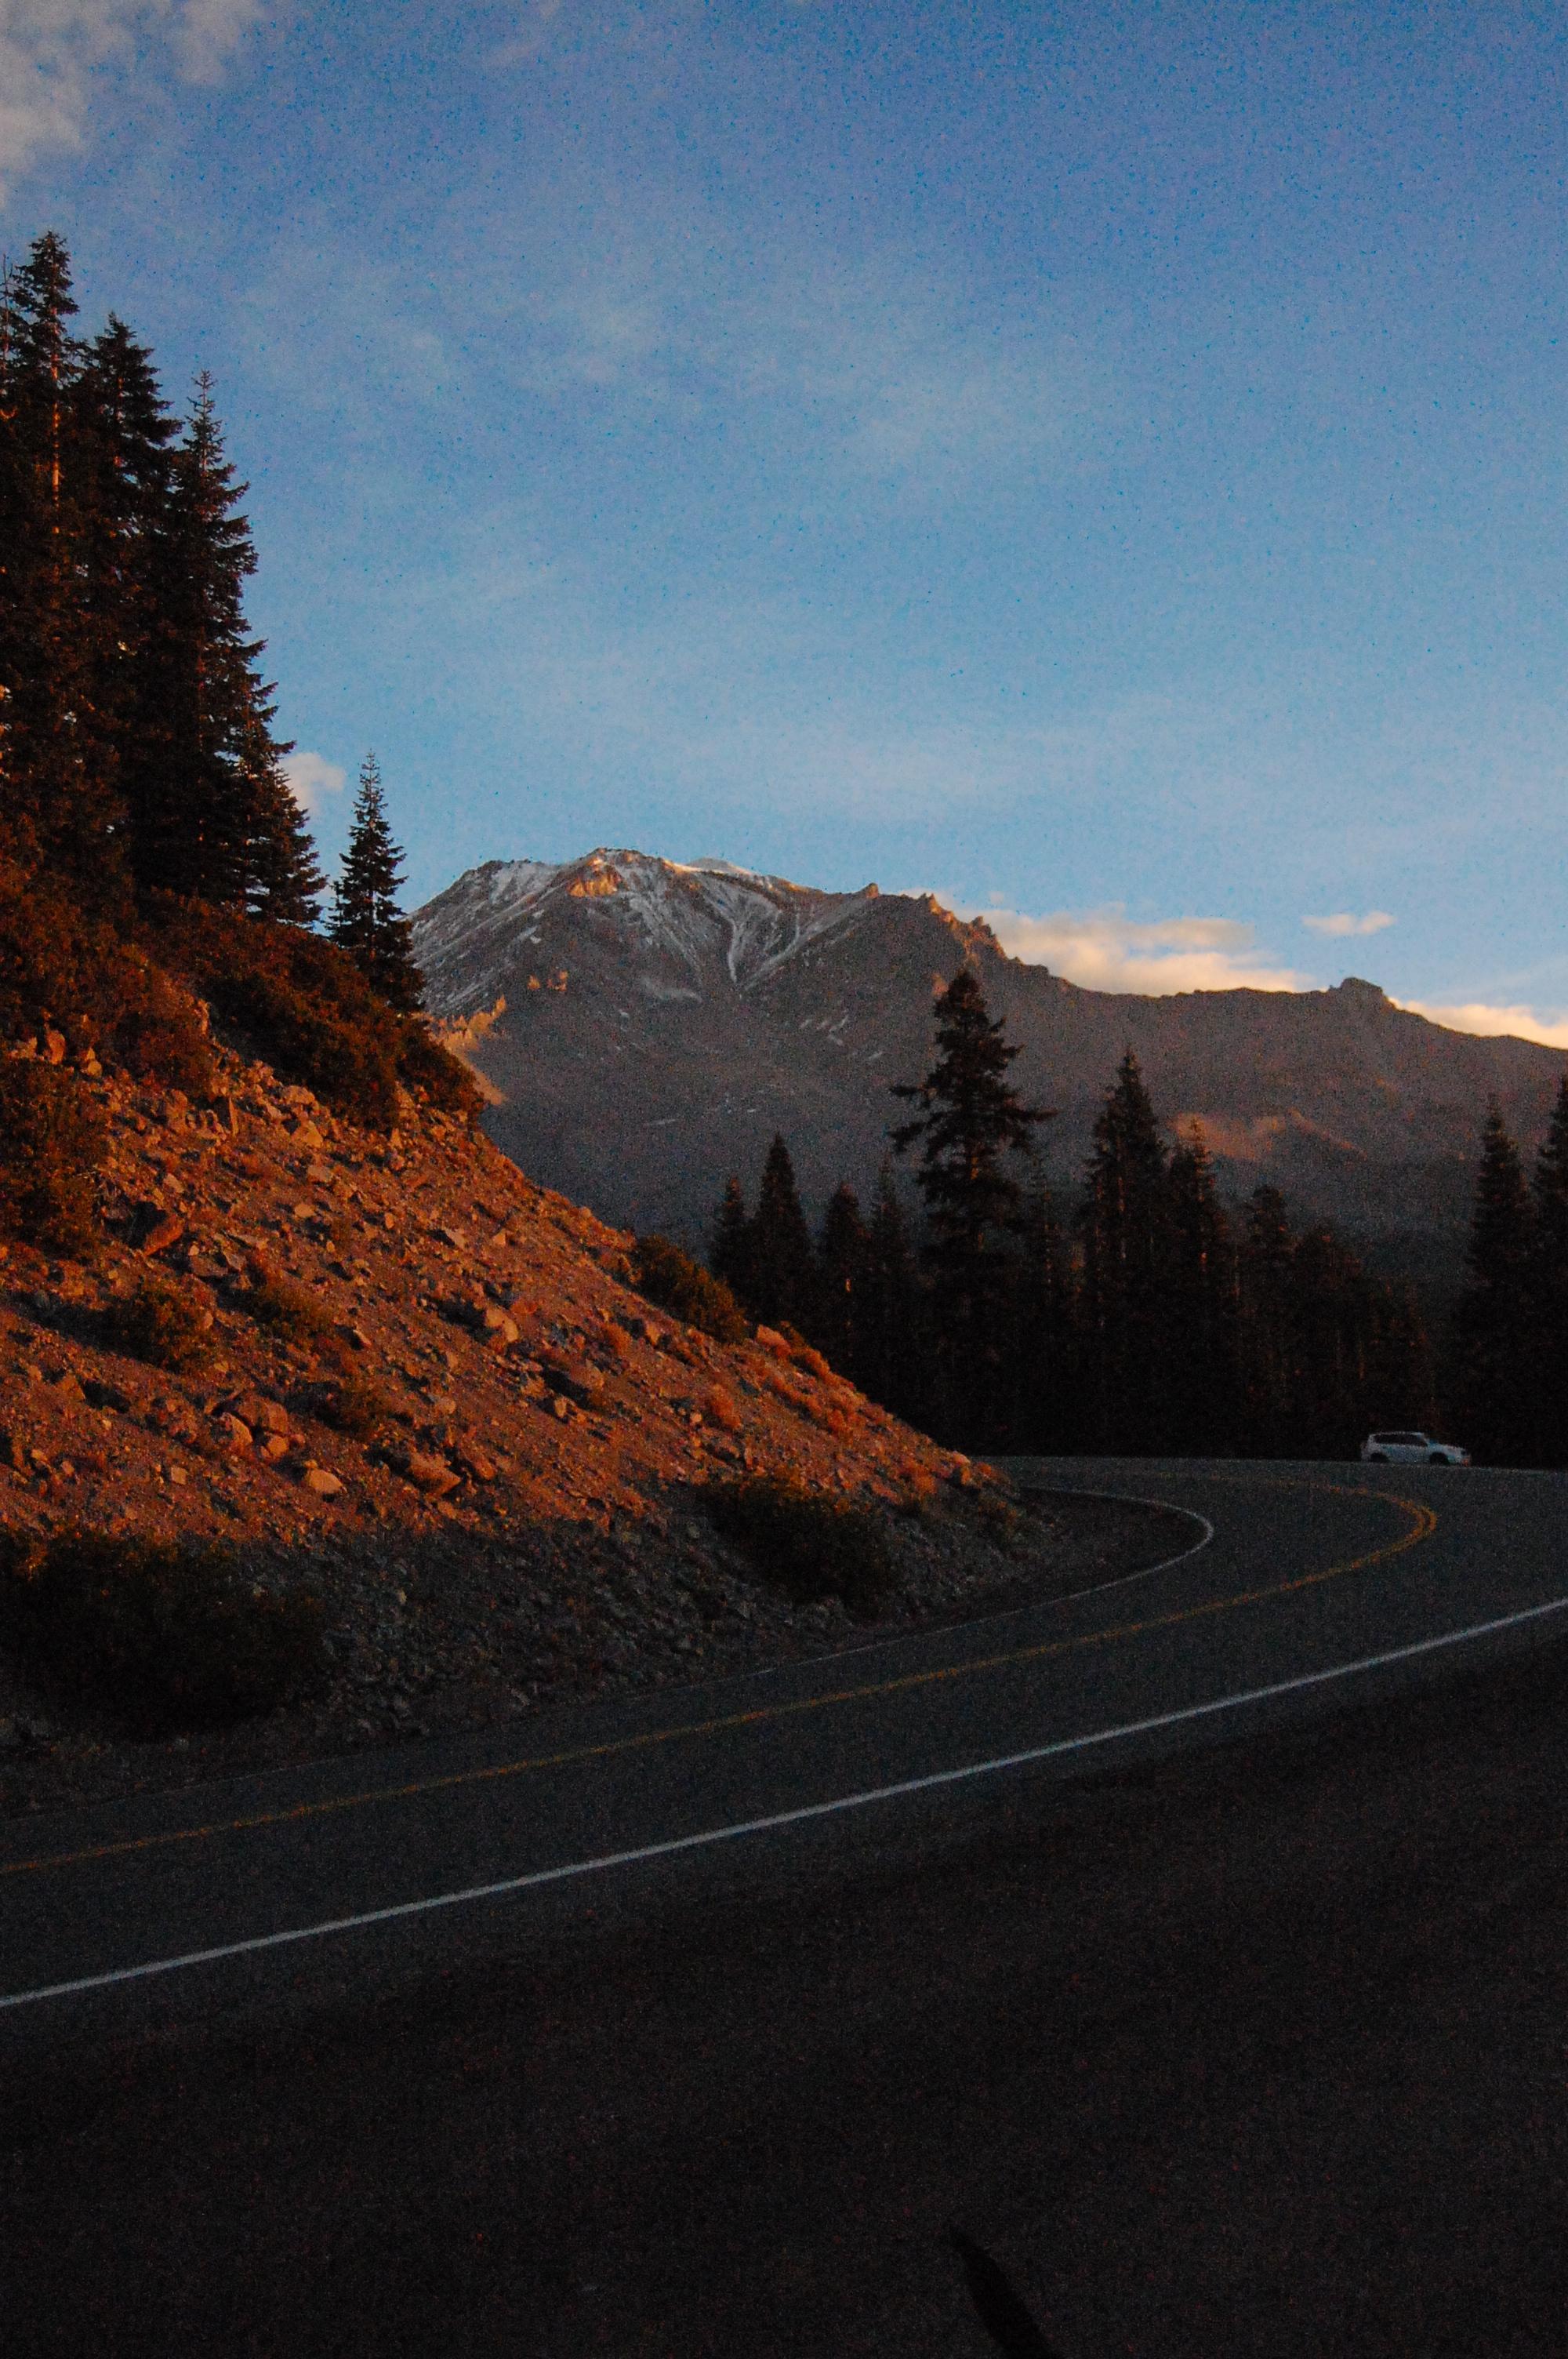 As the sun rose on Mount Shasta